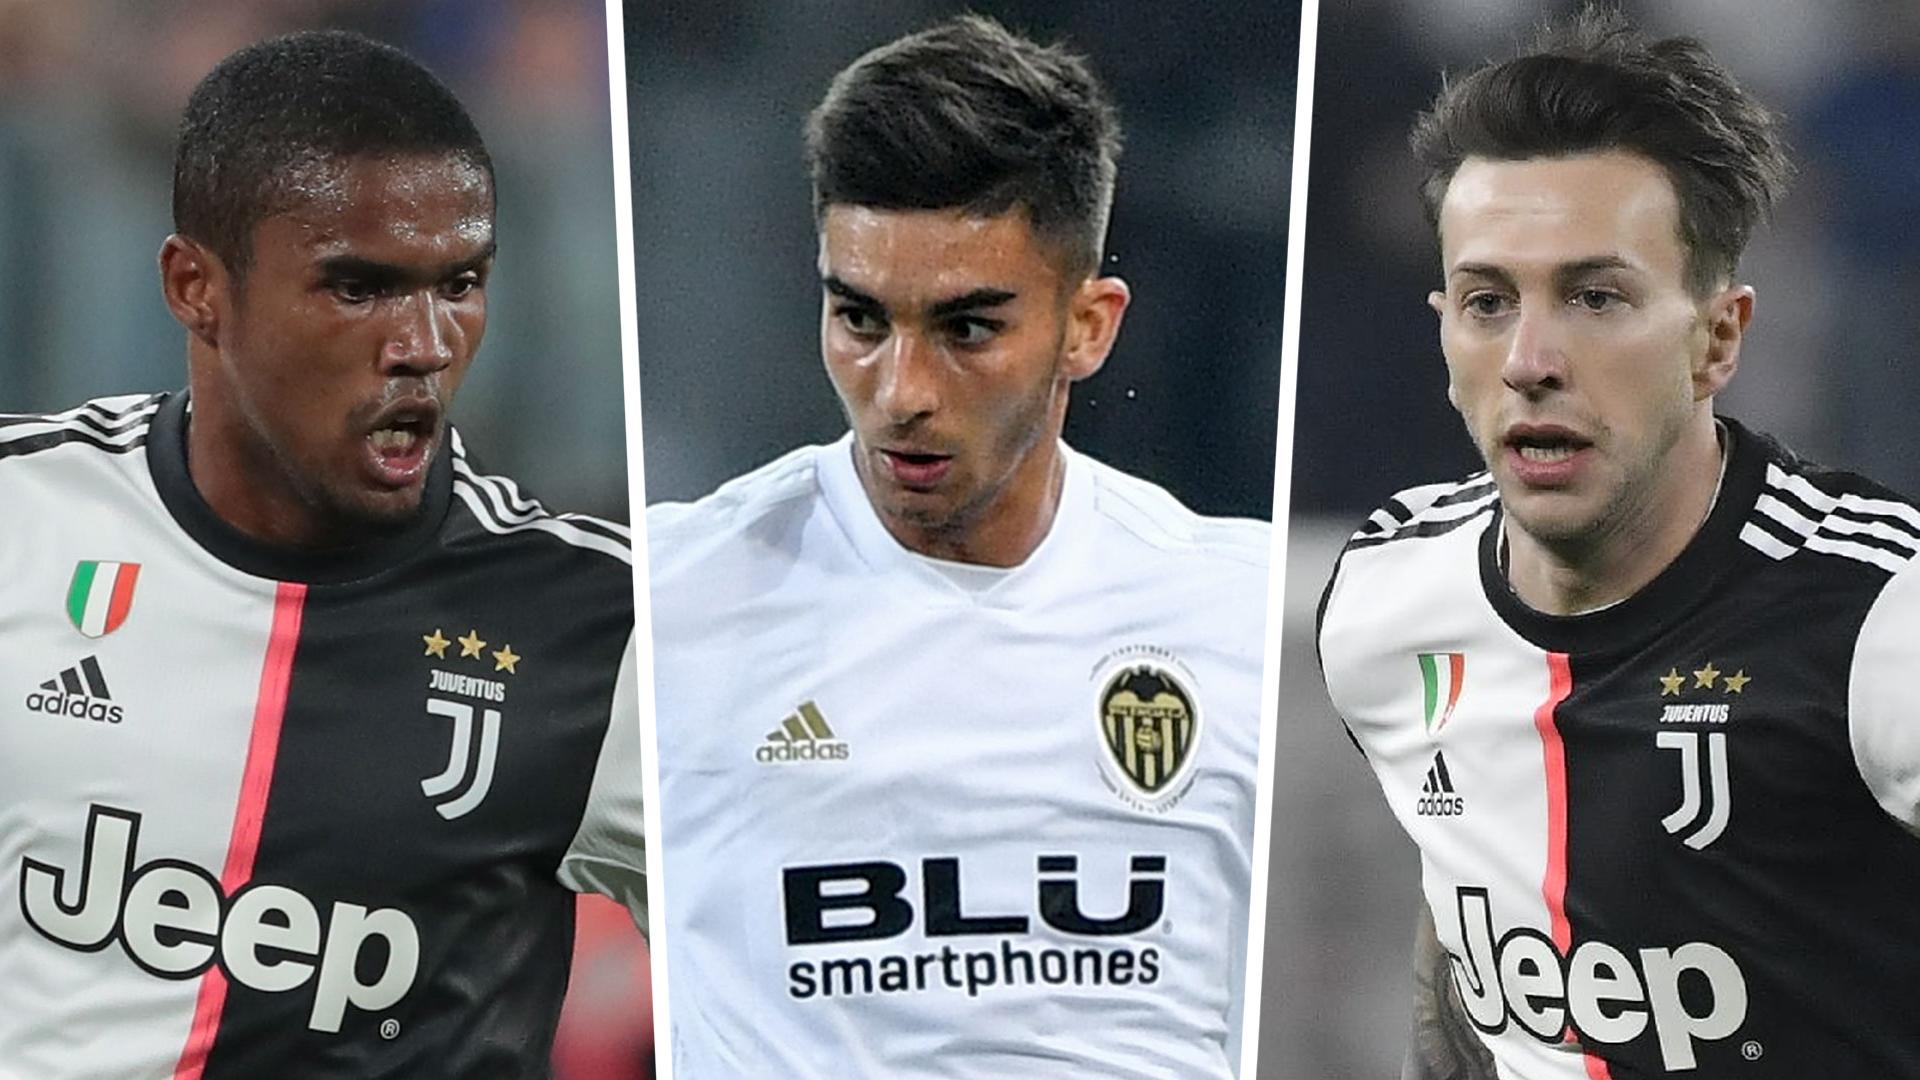 La Juventus envisage de vendre Douglas Costa et Bernardeschi